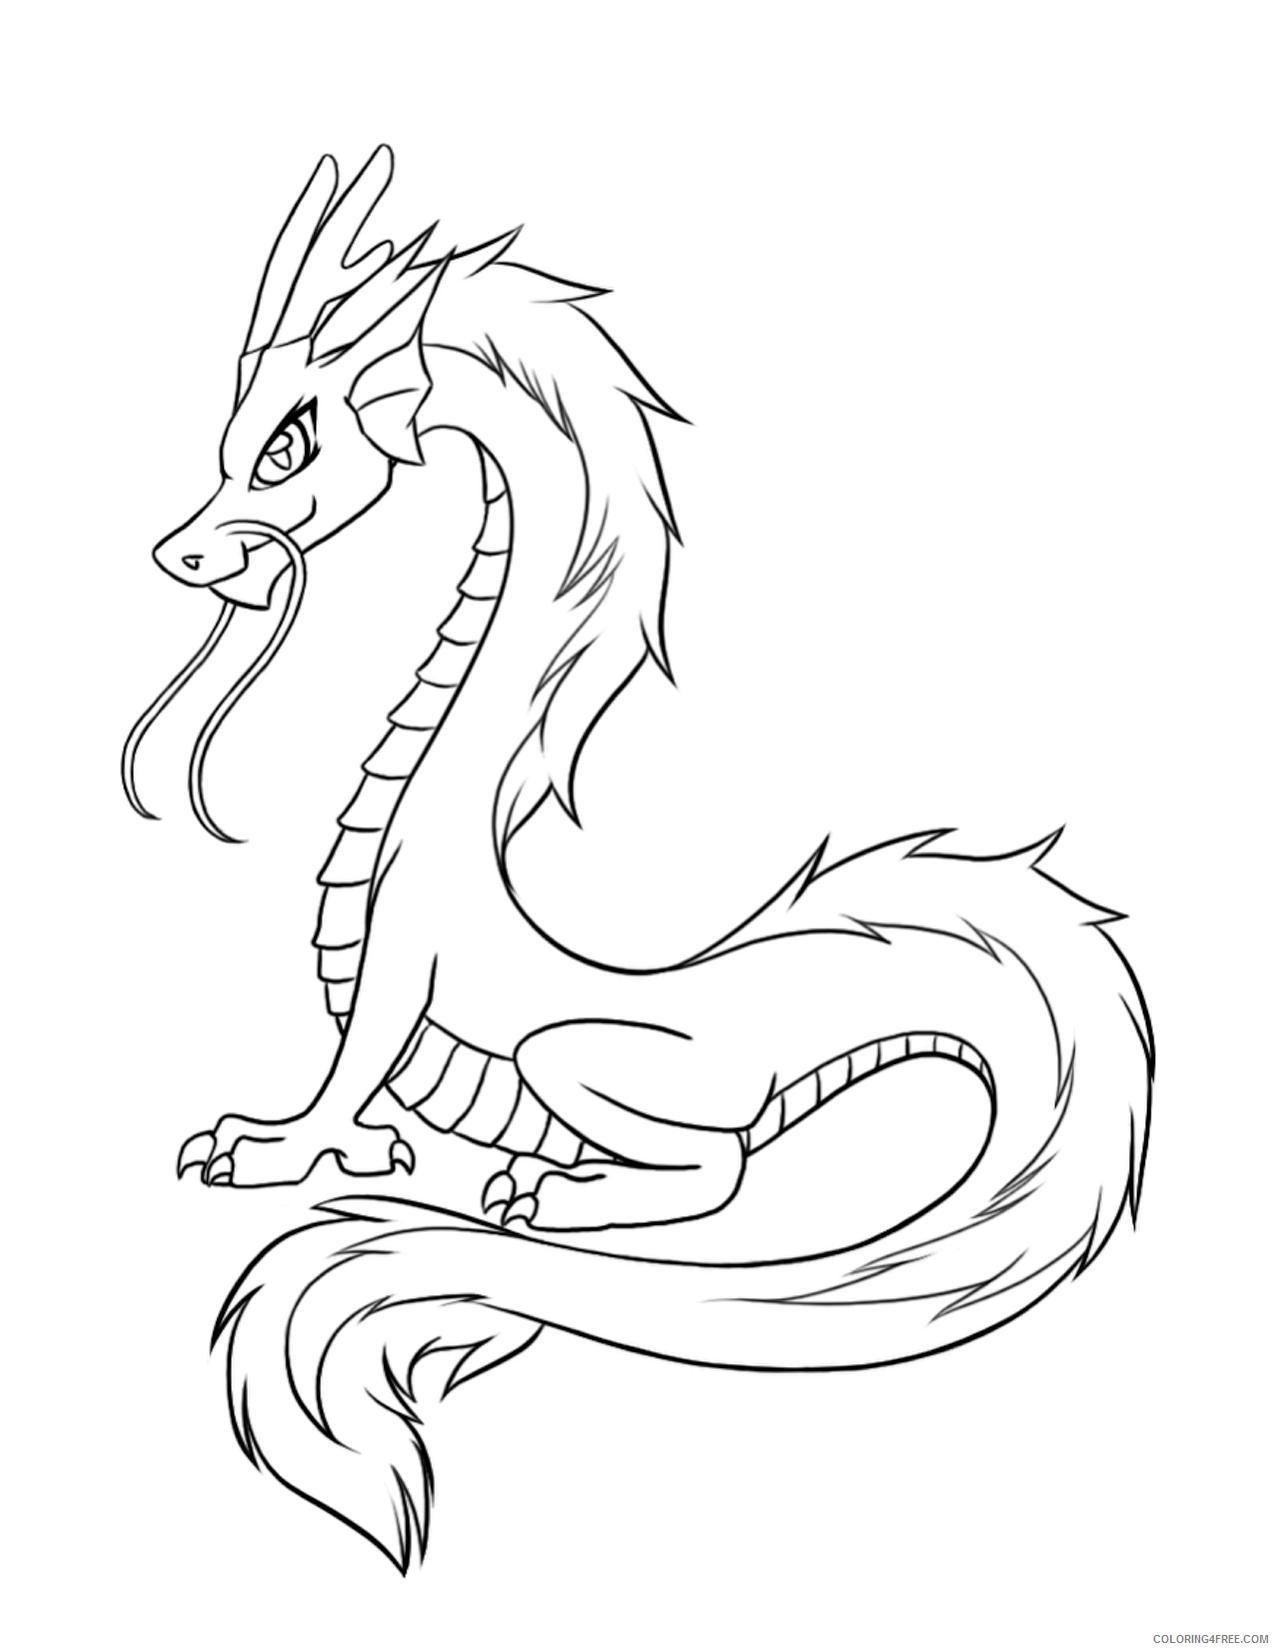 Fantasy Dragons Coloring Pages Real Dragon Printable 2021 2596 Coloring4free